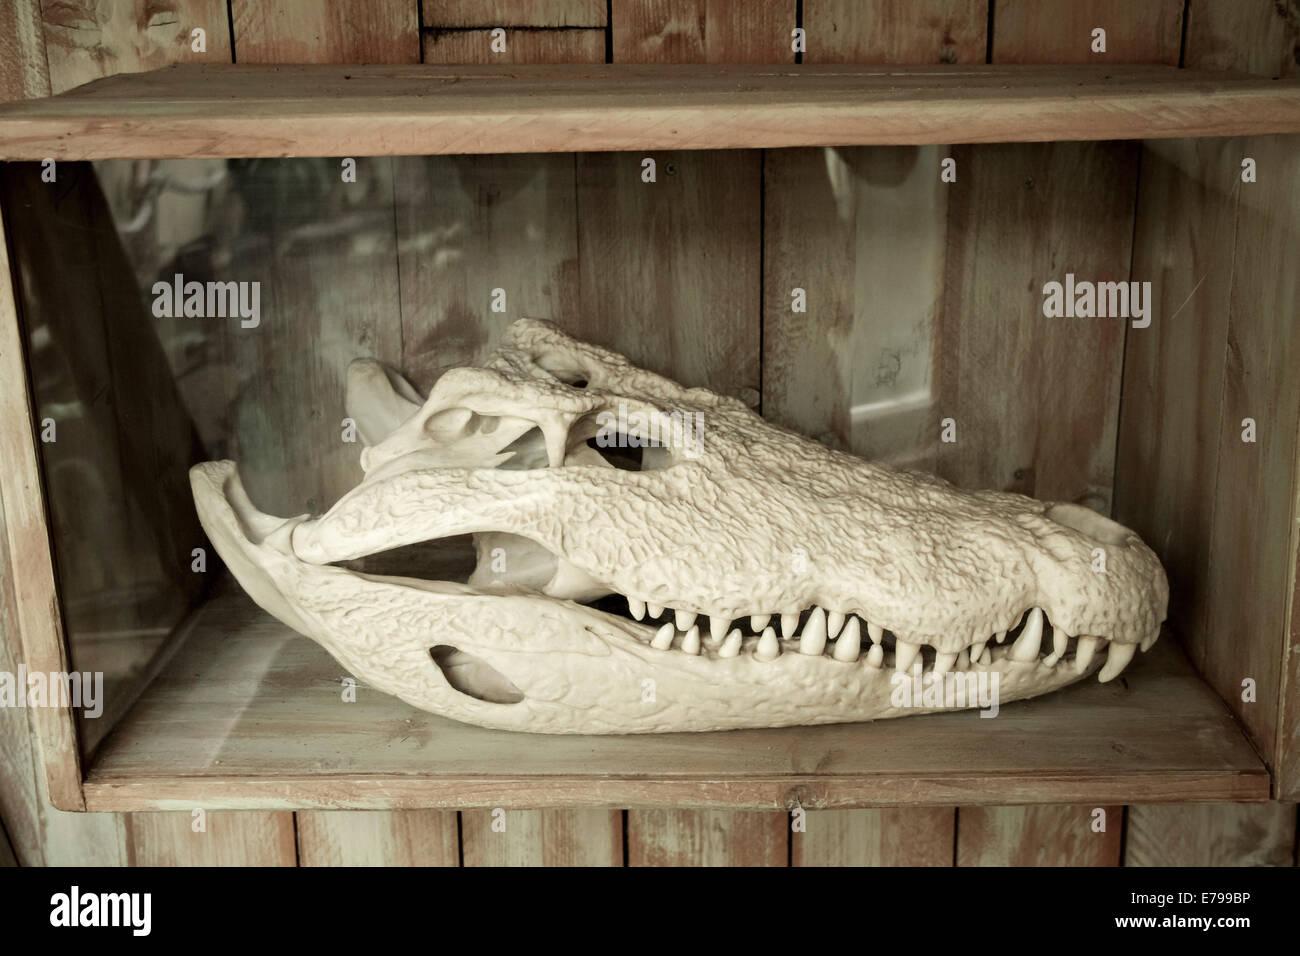 Crocodile Skeleton Stock Photos & Crocodile Skeleton Stock Images ...